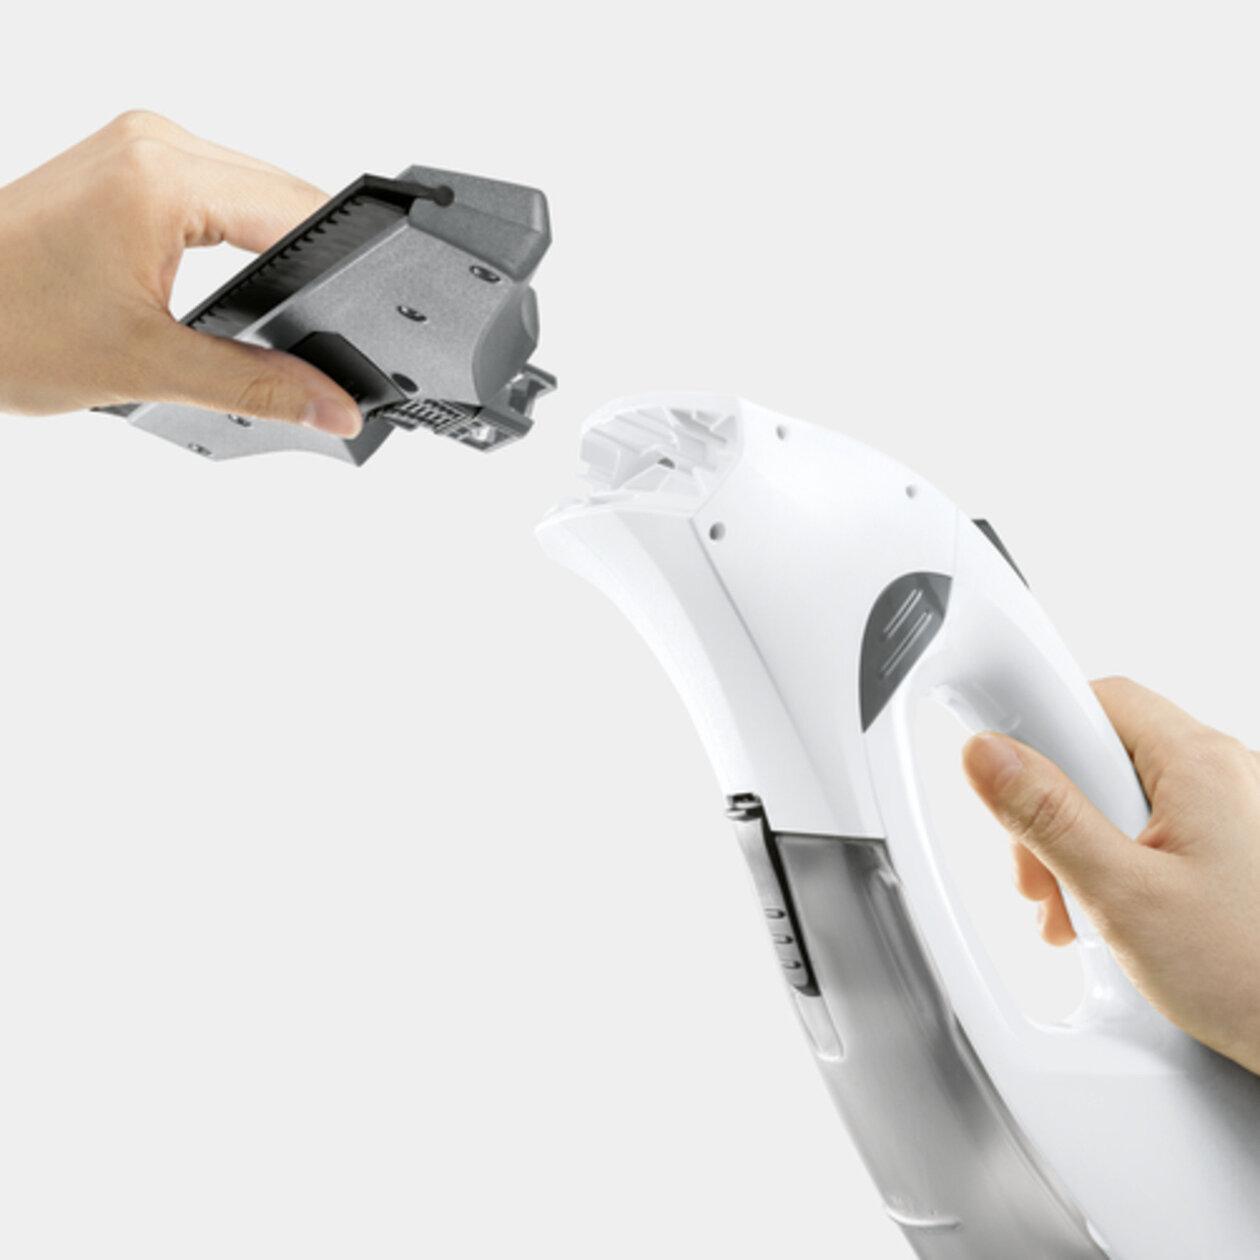 Оконный пылесос WV 2 Premium (white): Сменная всасывающая насадка